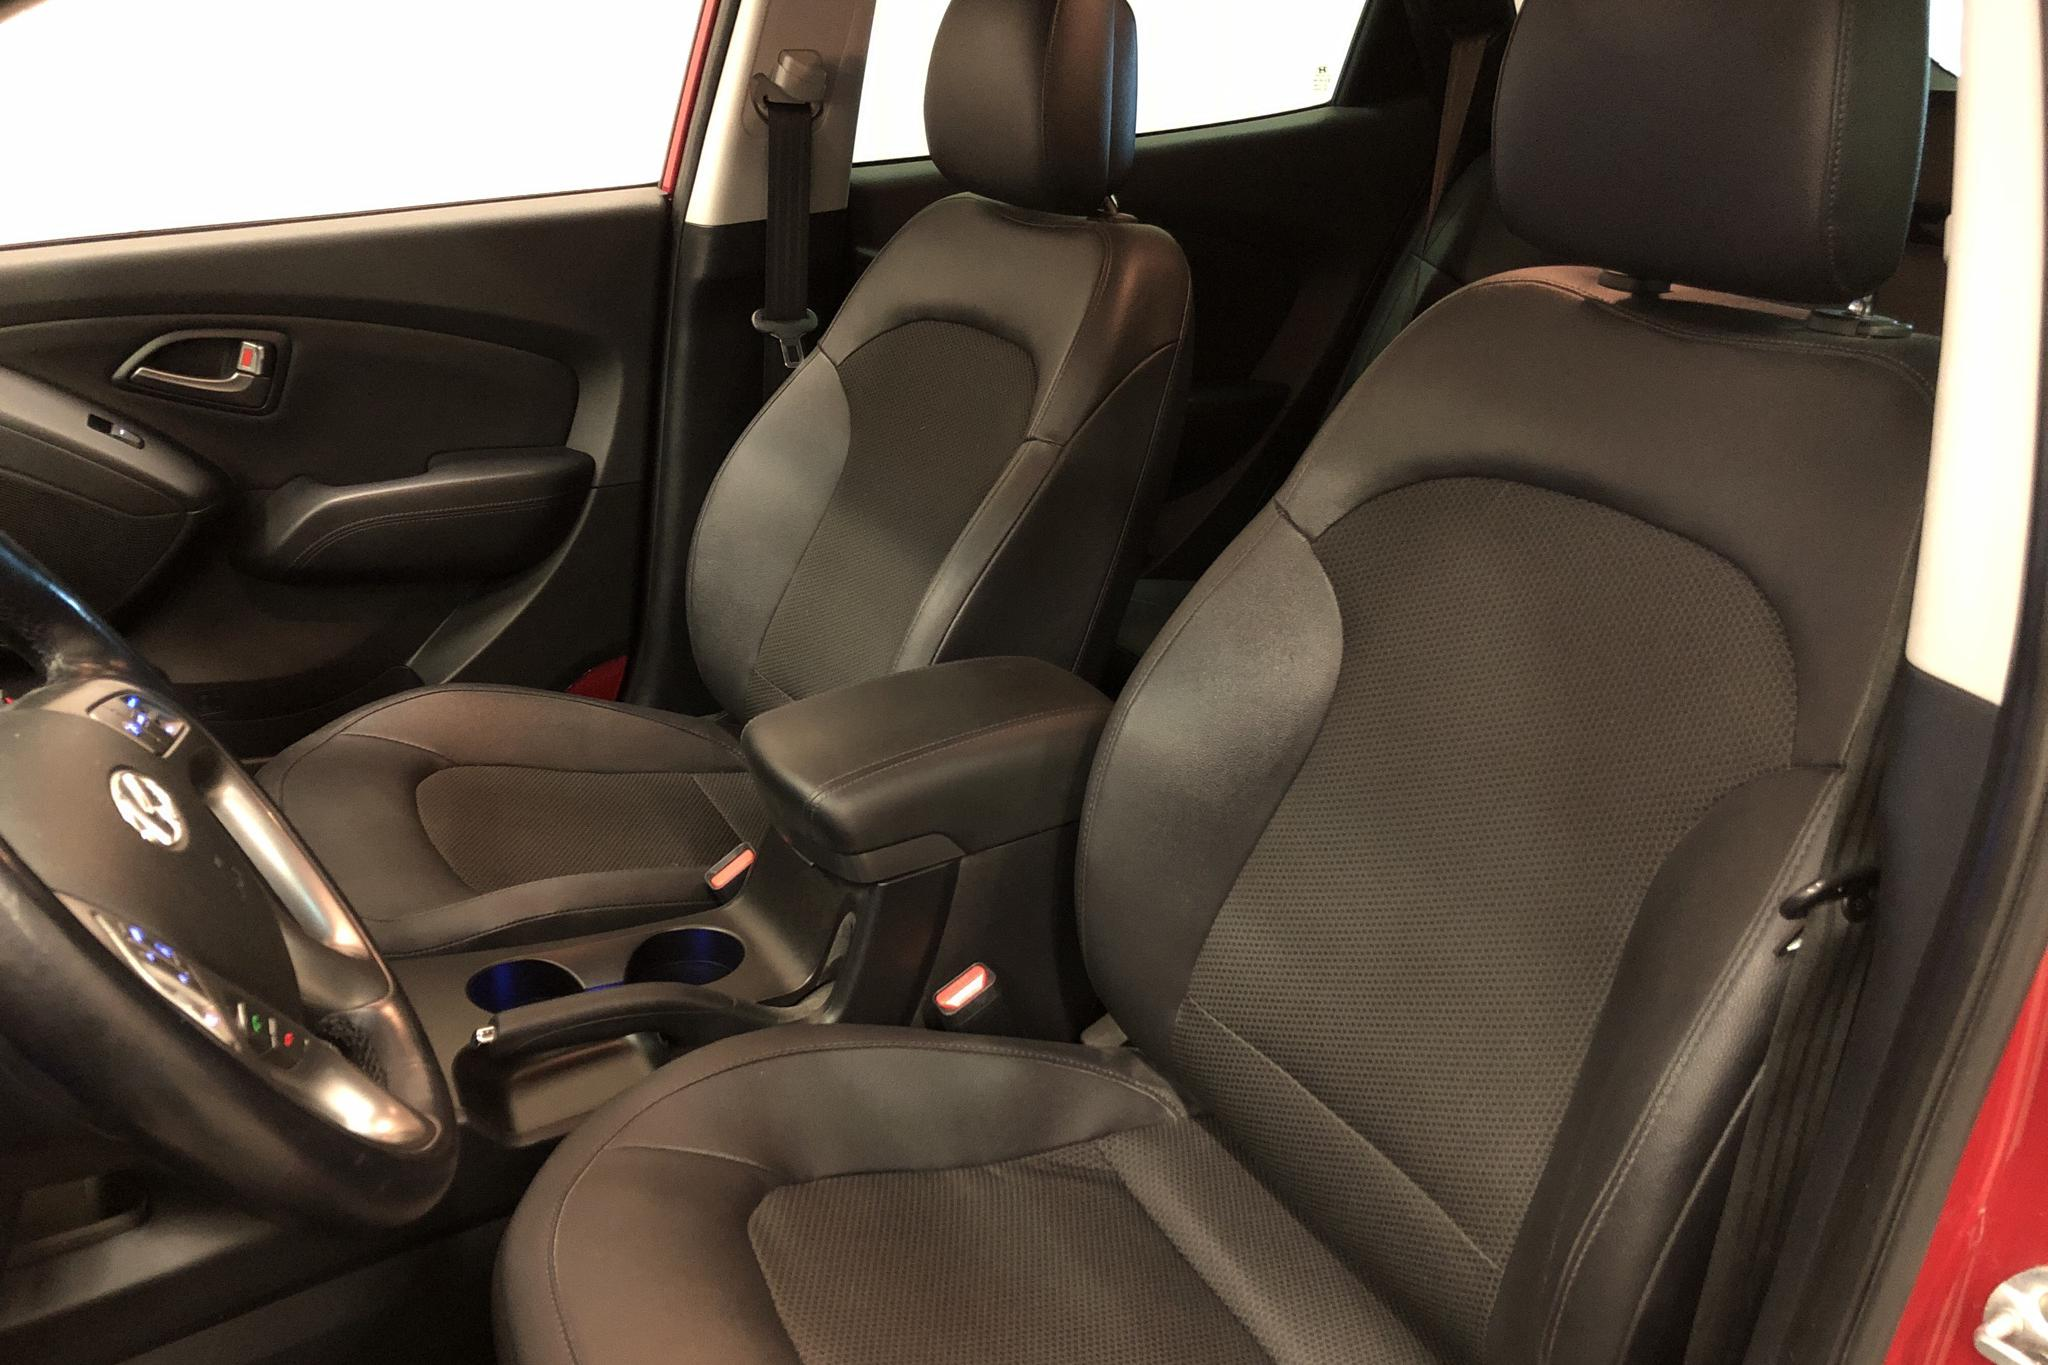 Hyundai ix35 2.0 CRDi-R 4WD (136hk) - 8 409 mil - Automat - röd - 2015